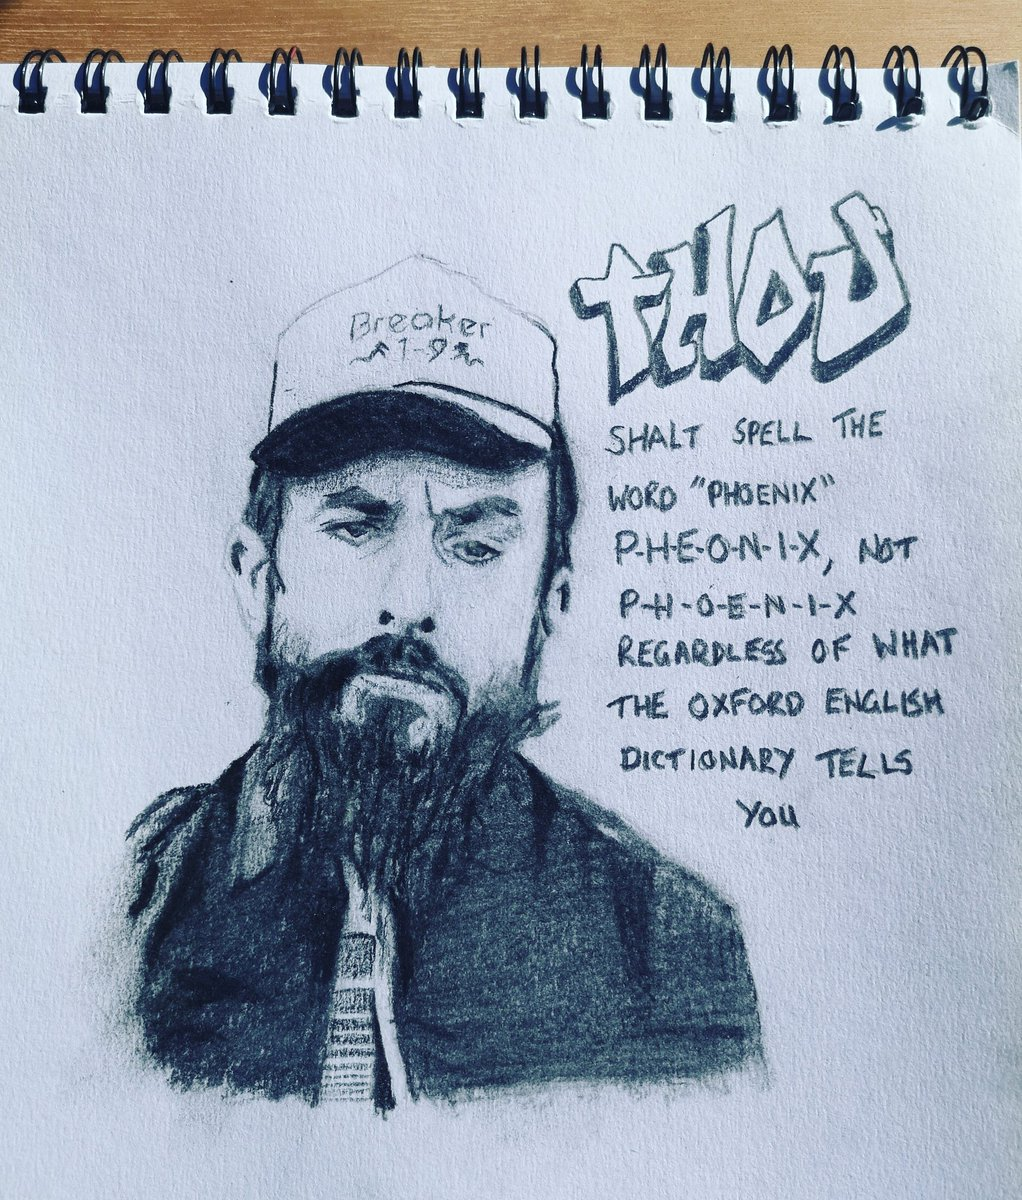 The lyrical genius that is @Scroobiuspipyo #doodle #art #sketchbook #sketch #Pencildrawing #6MusicArt #charcoalsketch #Charcoal #rapper #scroobiuspip #lyrics #graffitipic.twitter.com/eY2XbwRdVK